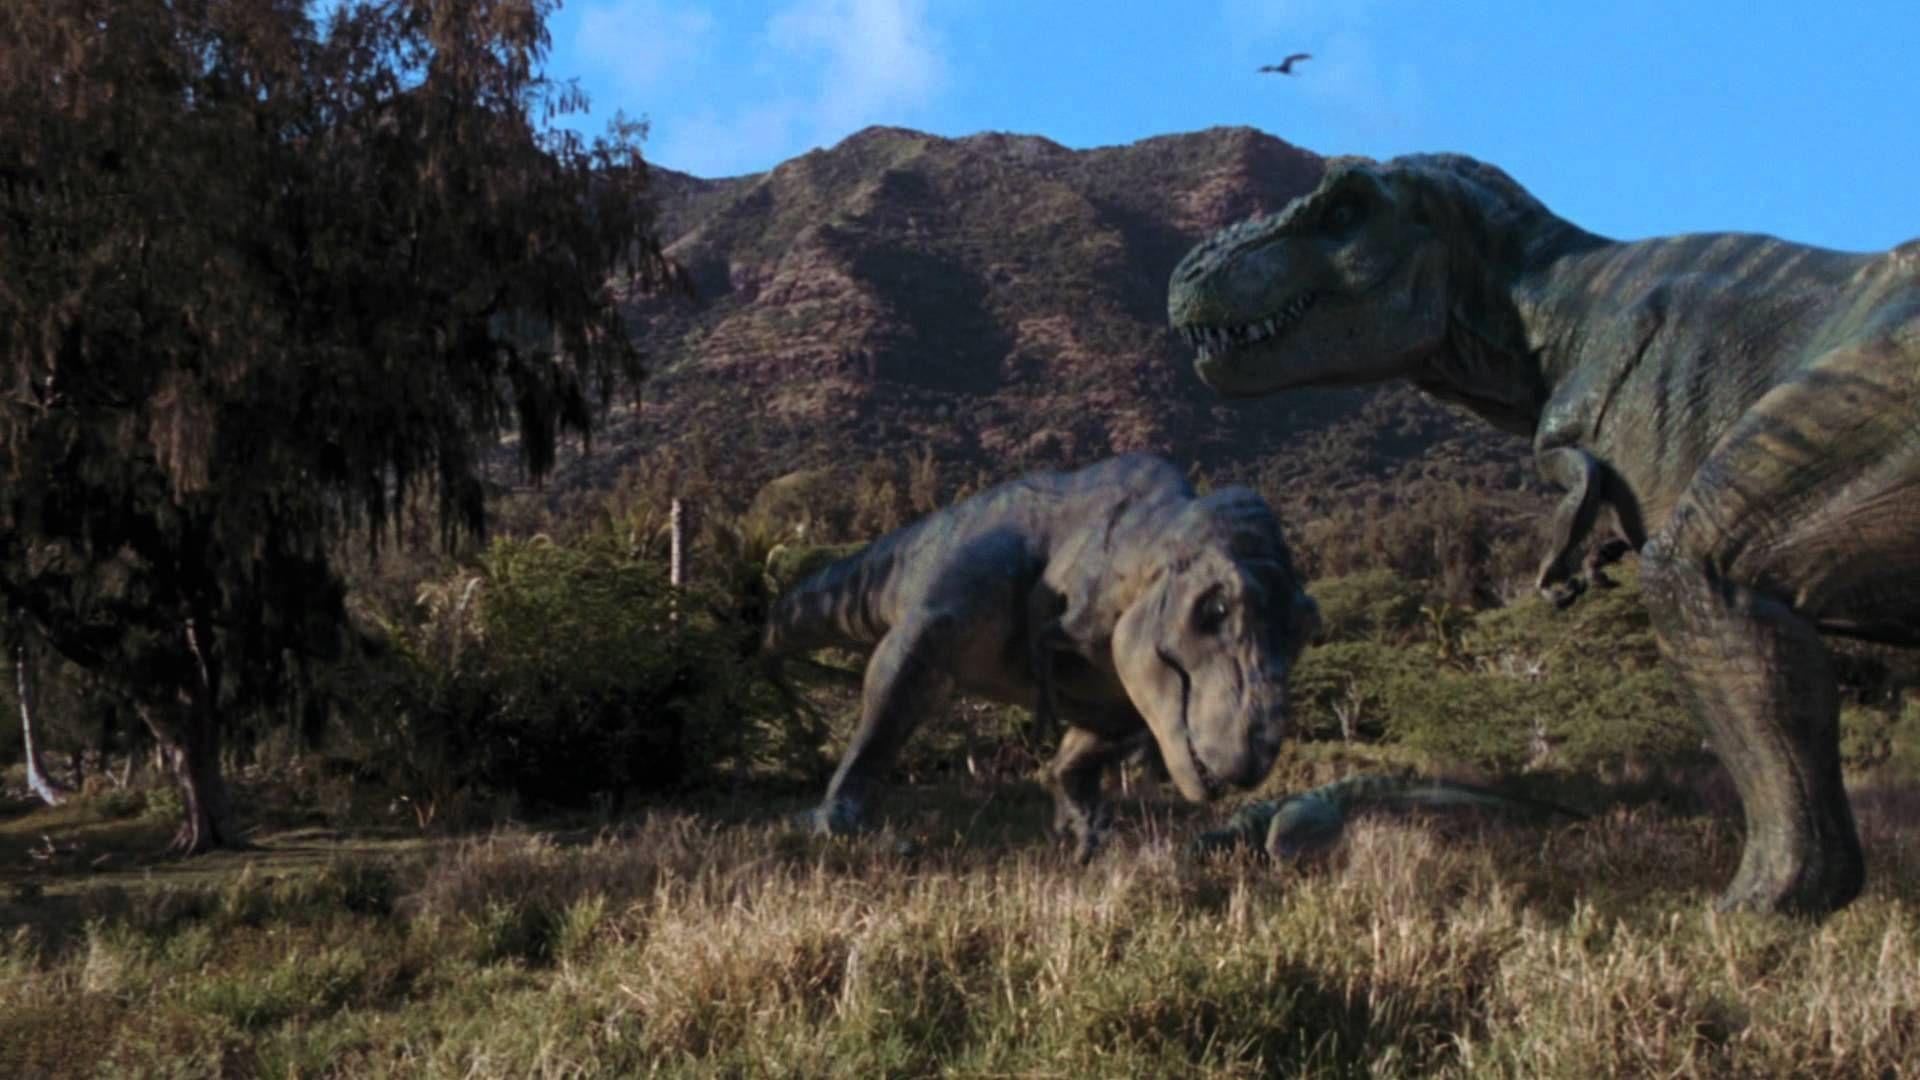 Jurassic park card 3 by chicagocubsfan24 on deviantart - The Lost World Jurassic Park